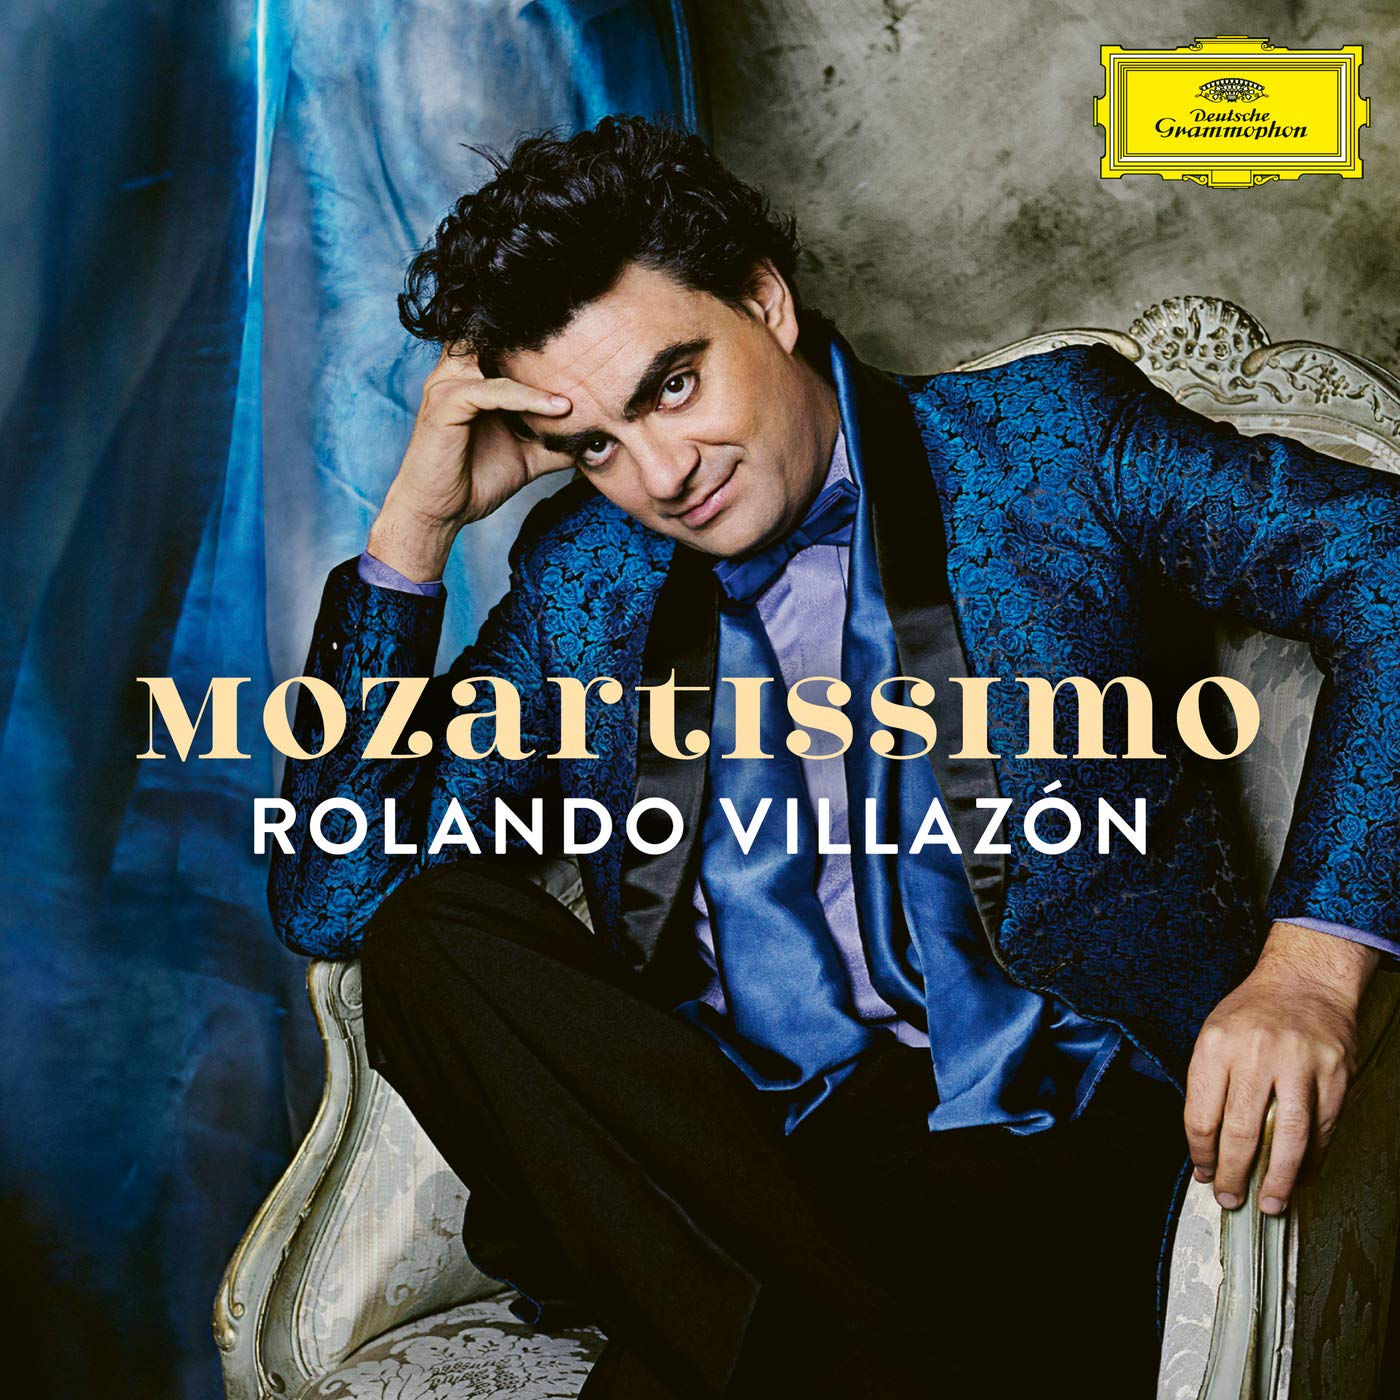 Mozartissimo: la pasión mozartiana de Rolando Villazón